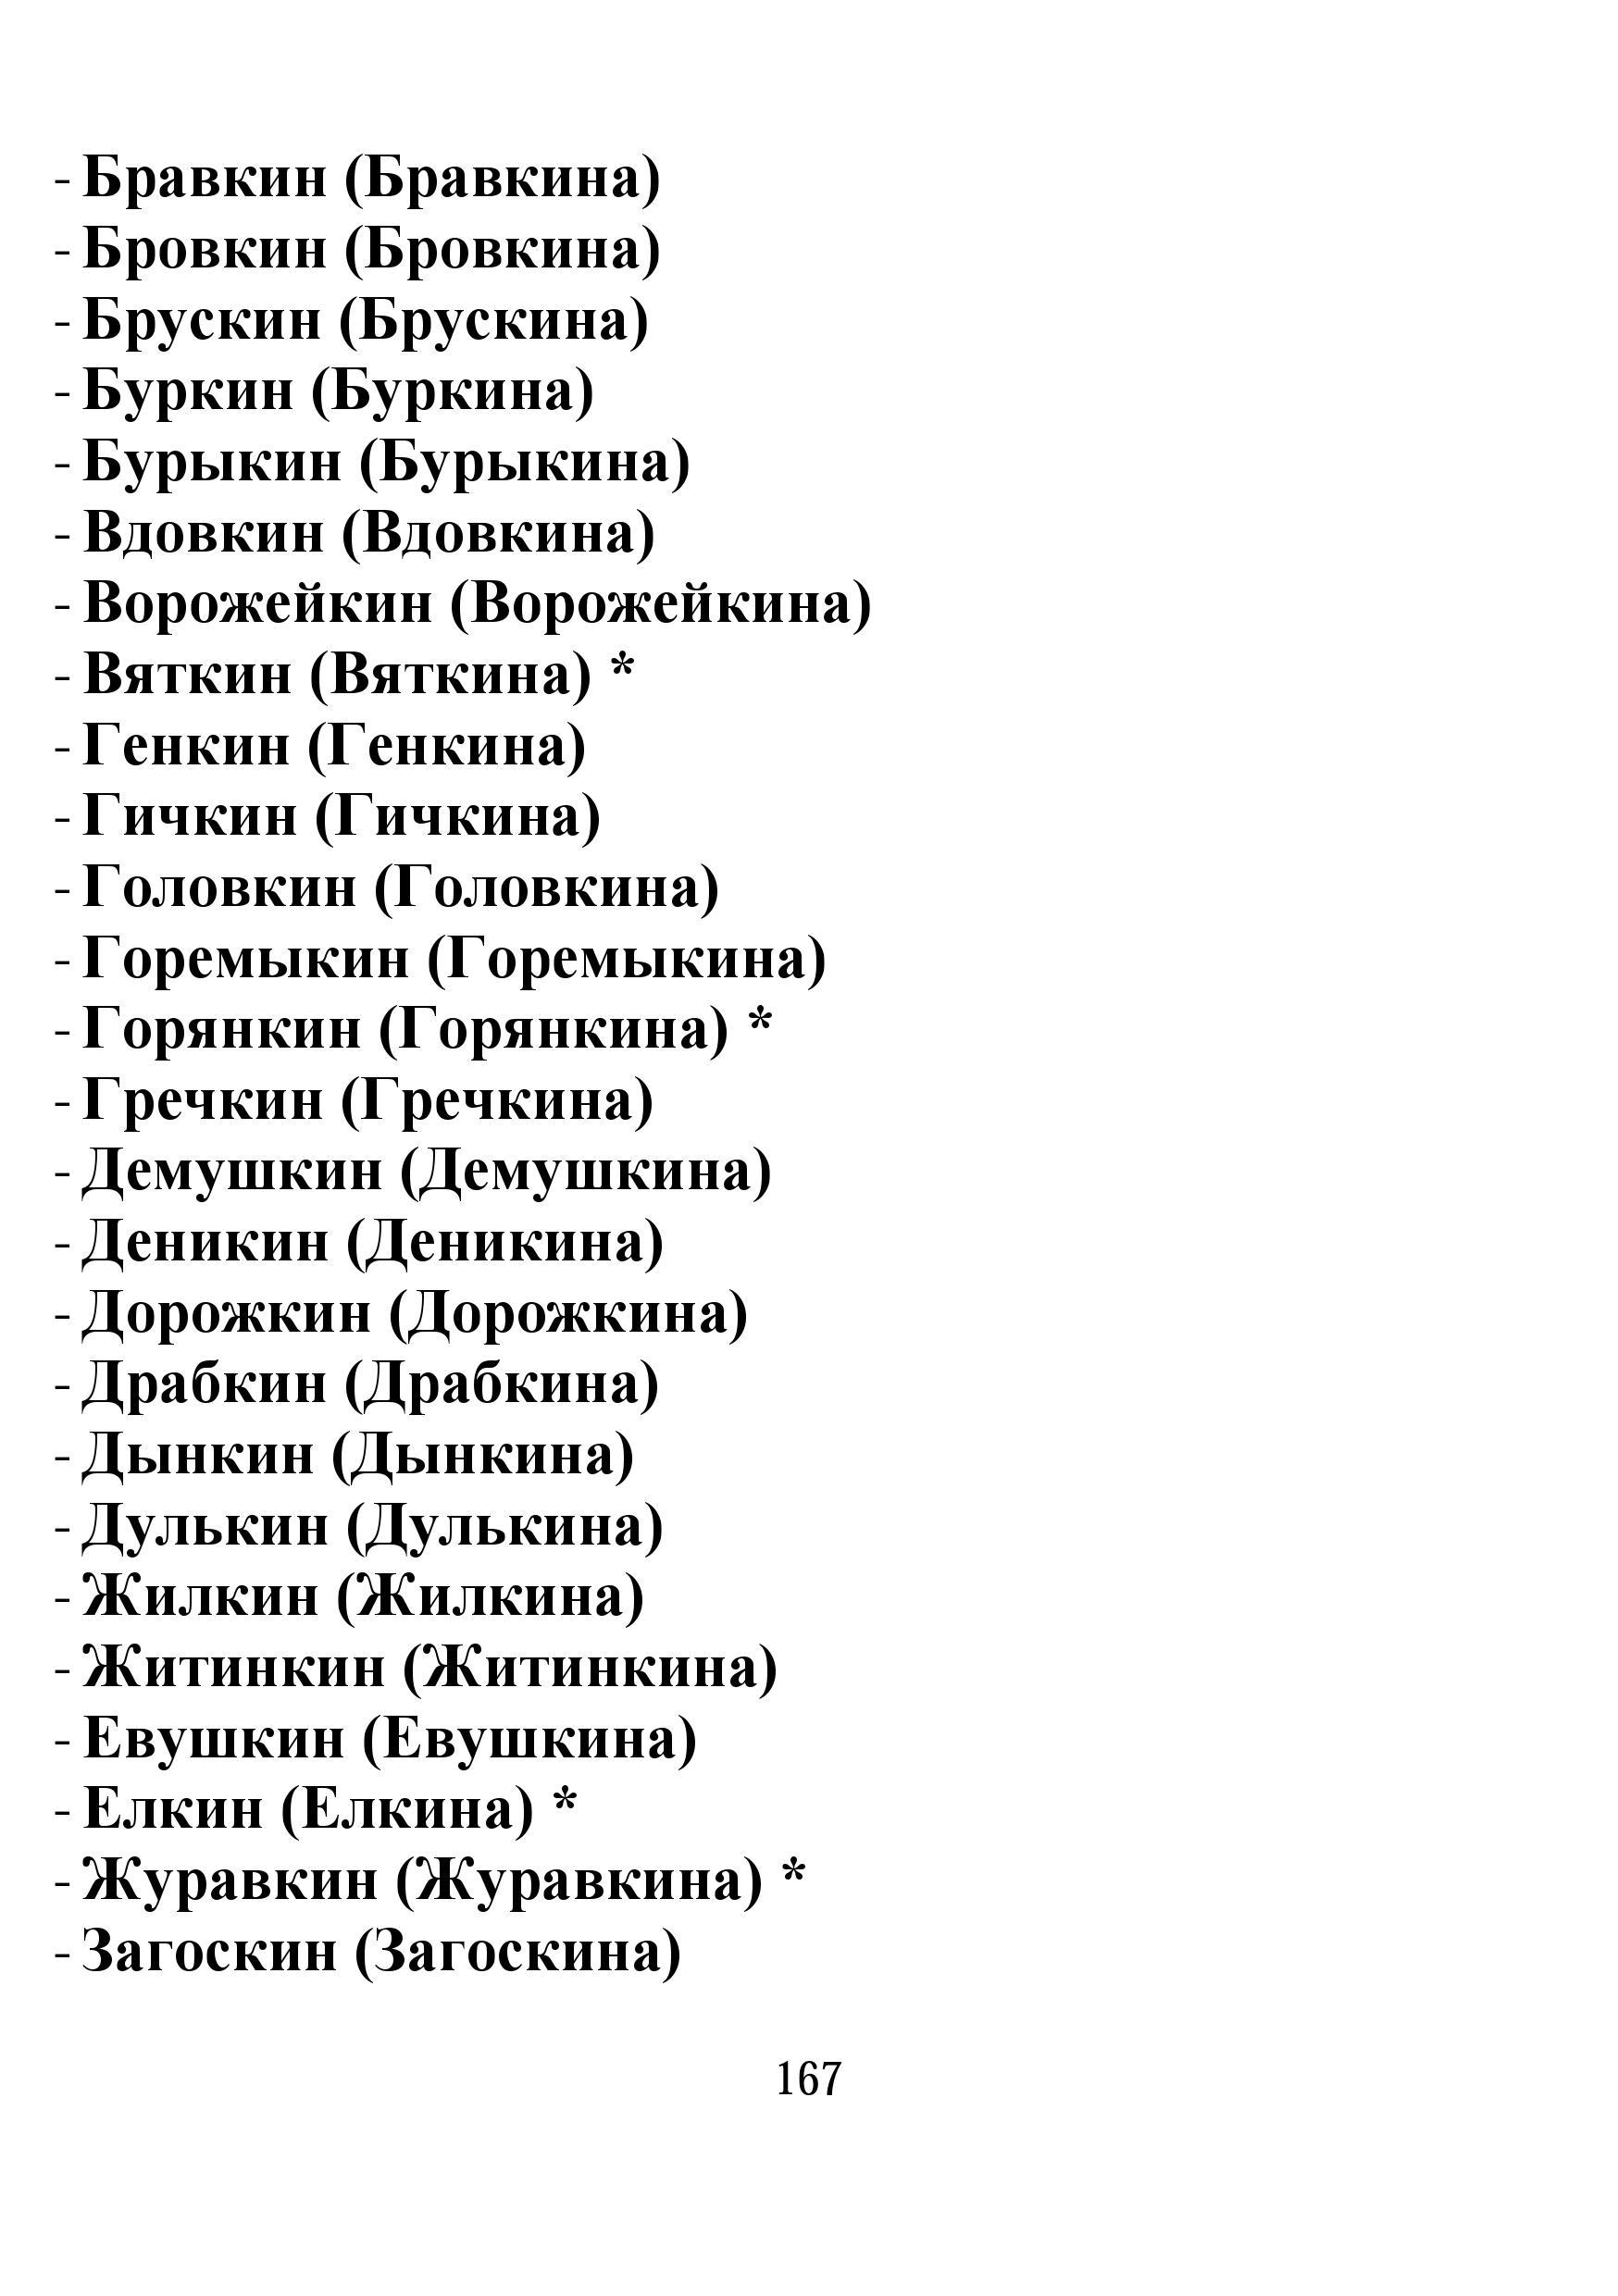 http://sf.uploads.ru/5a6Vy.jpg